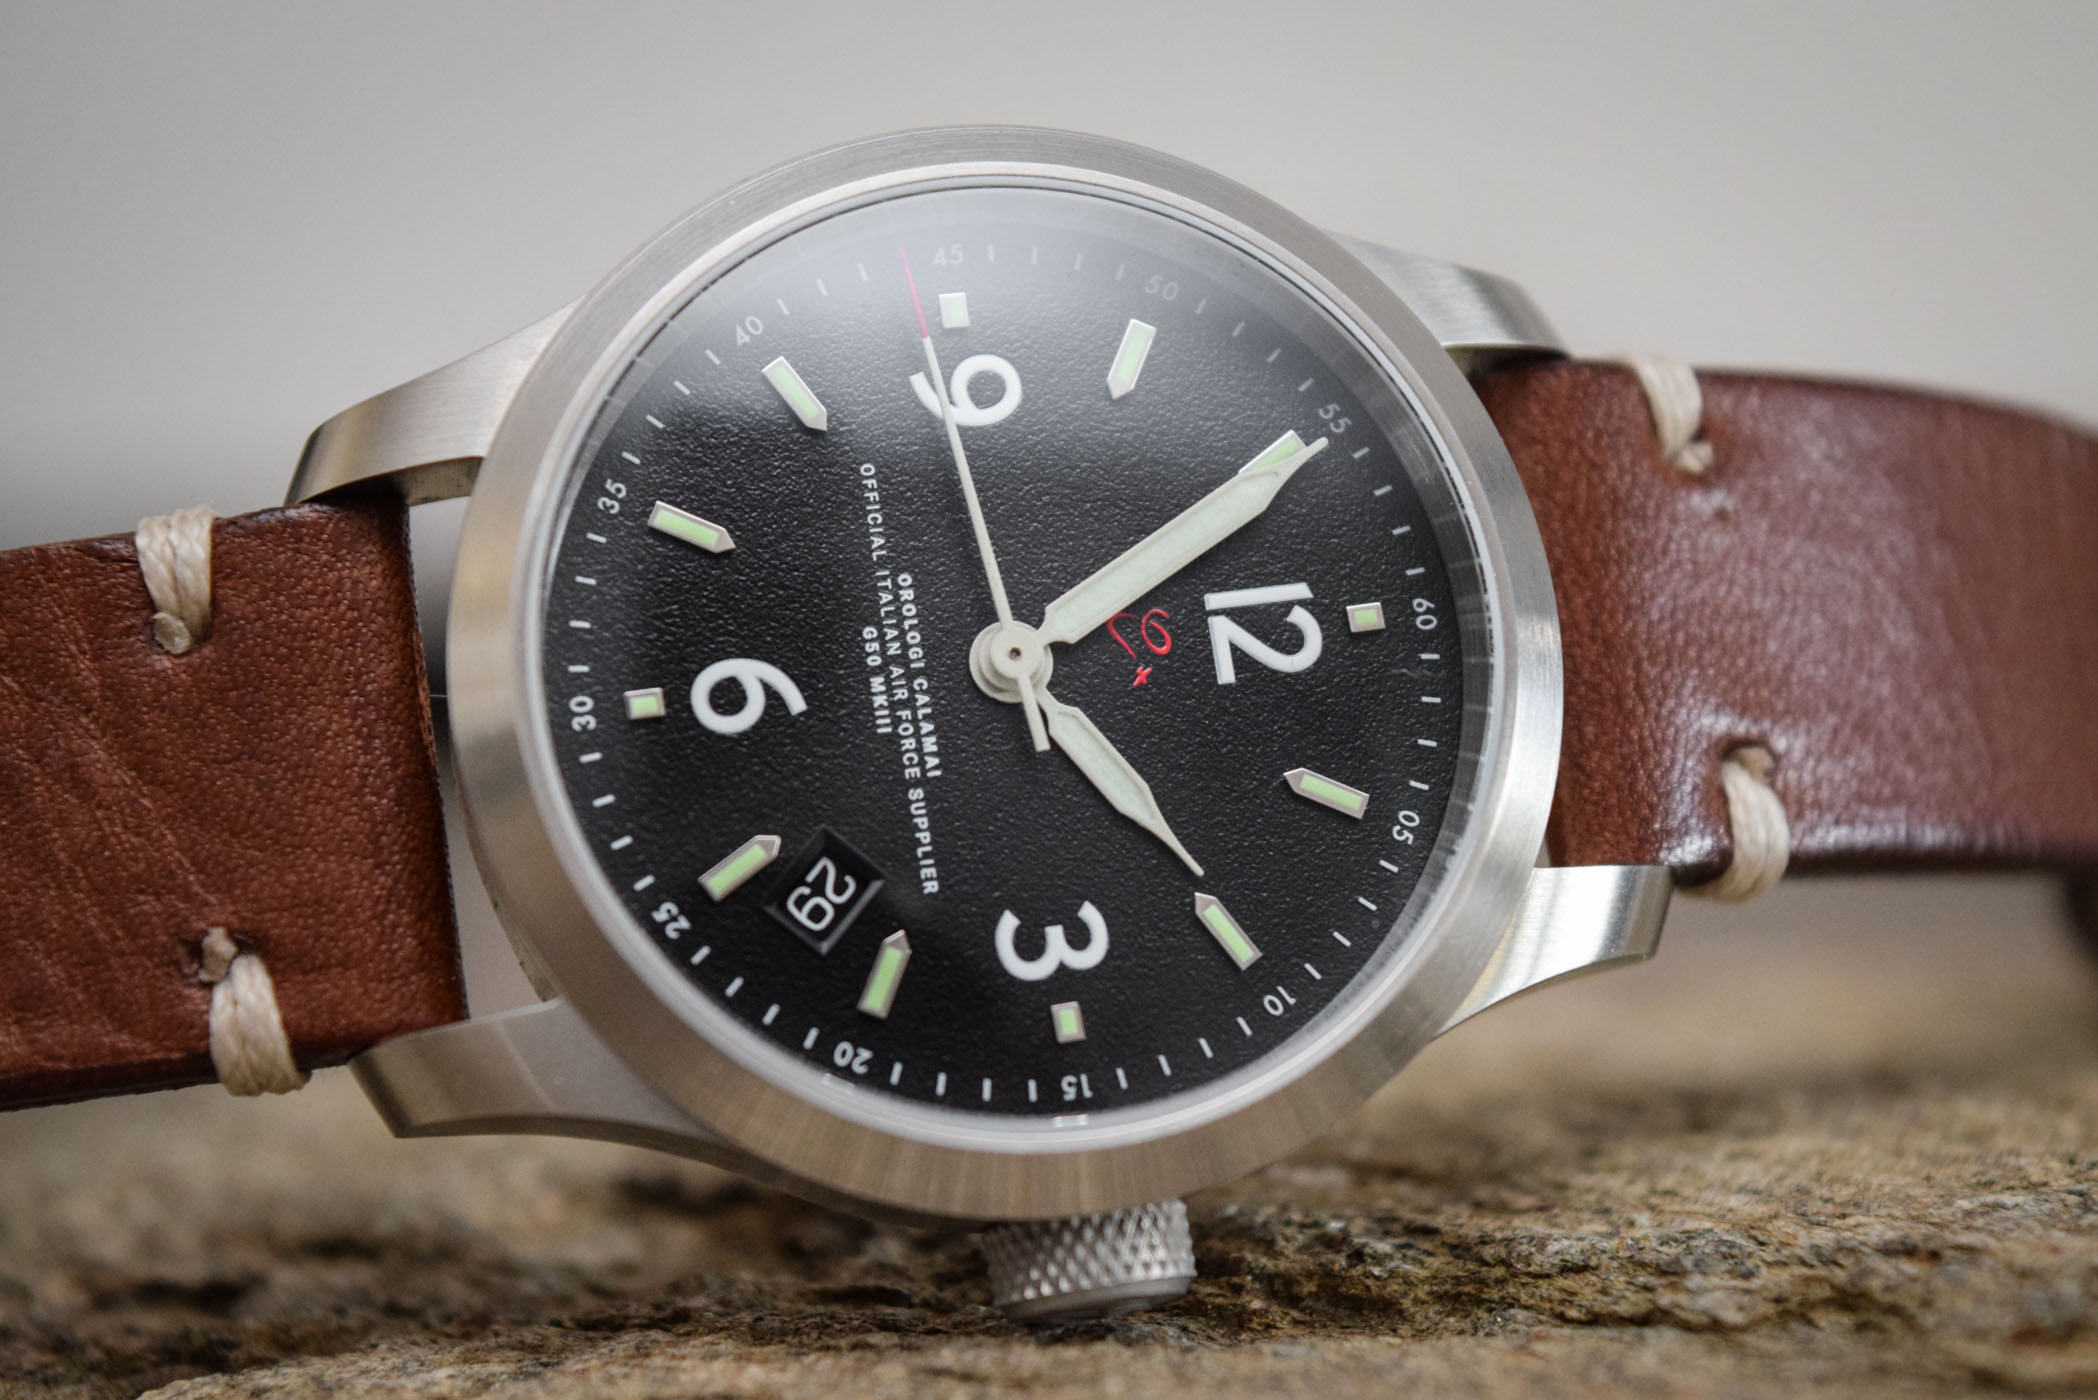 Orologi Calamai G50 MKIII Solotempo Pilot Watch